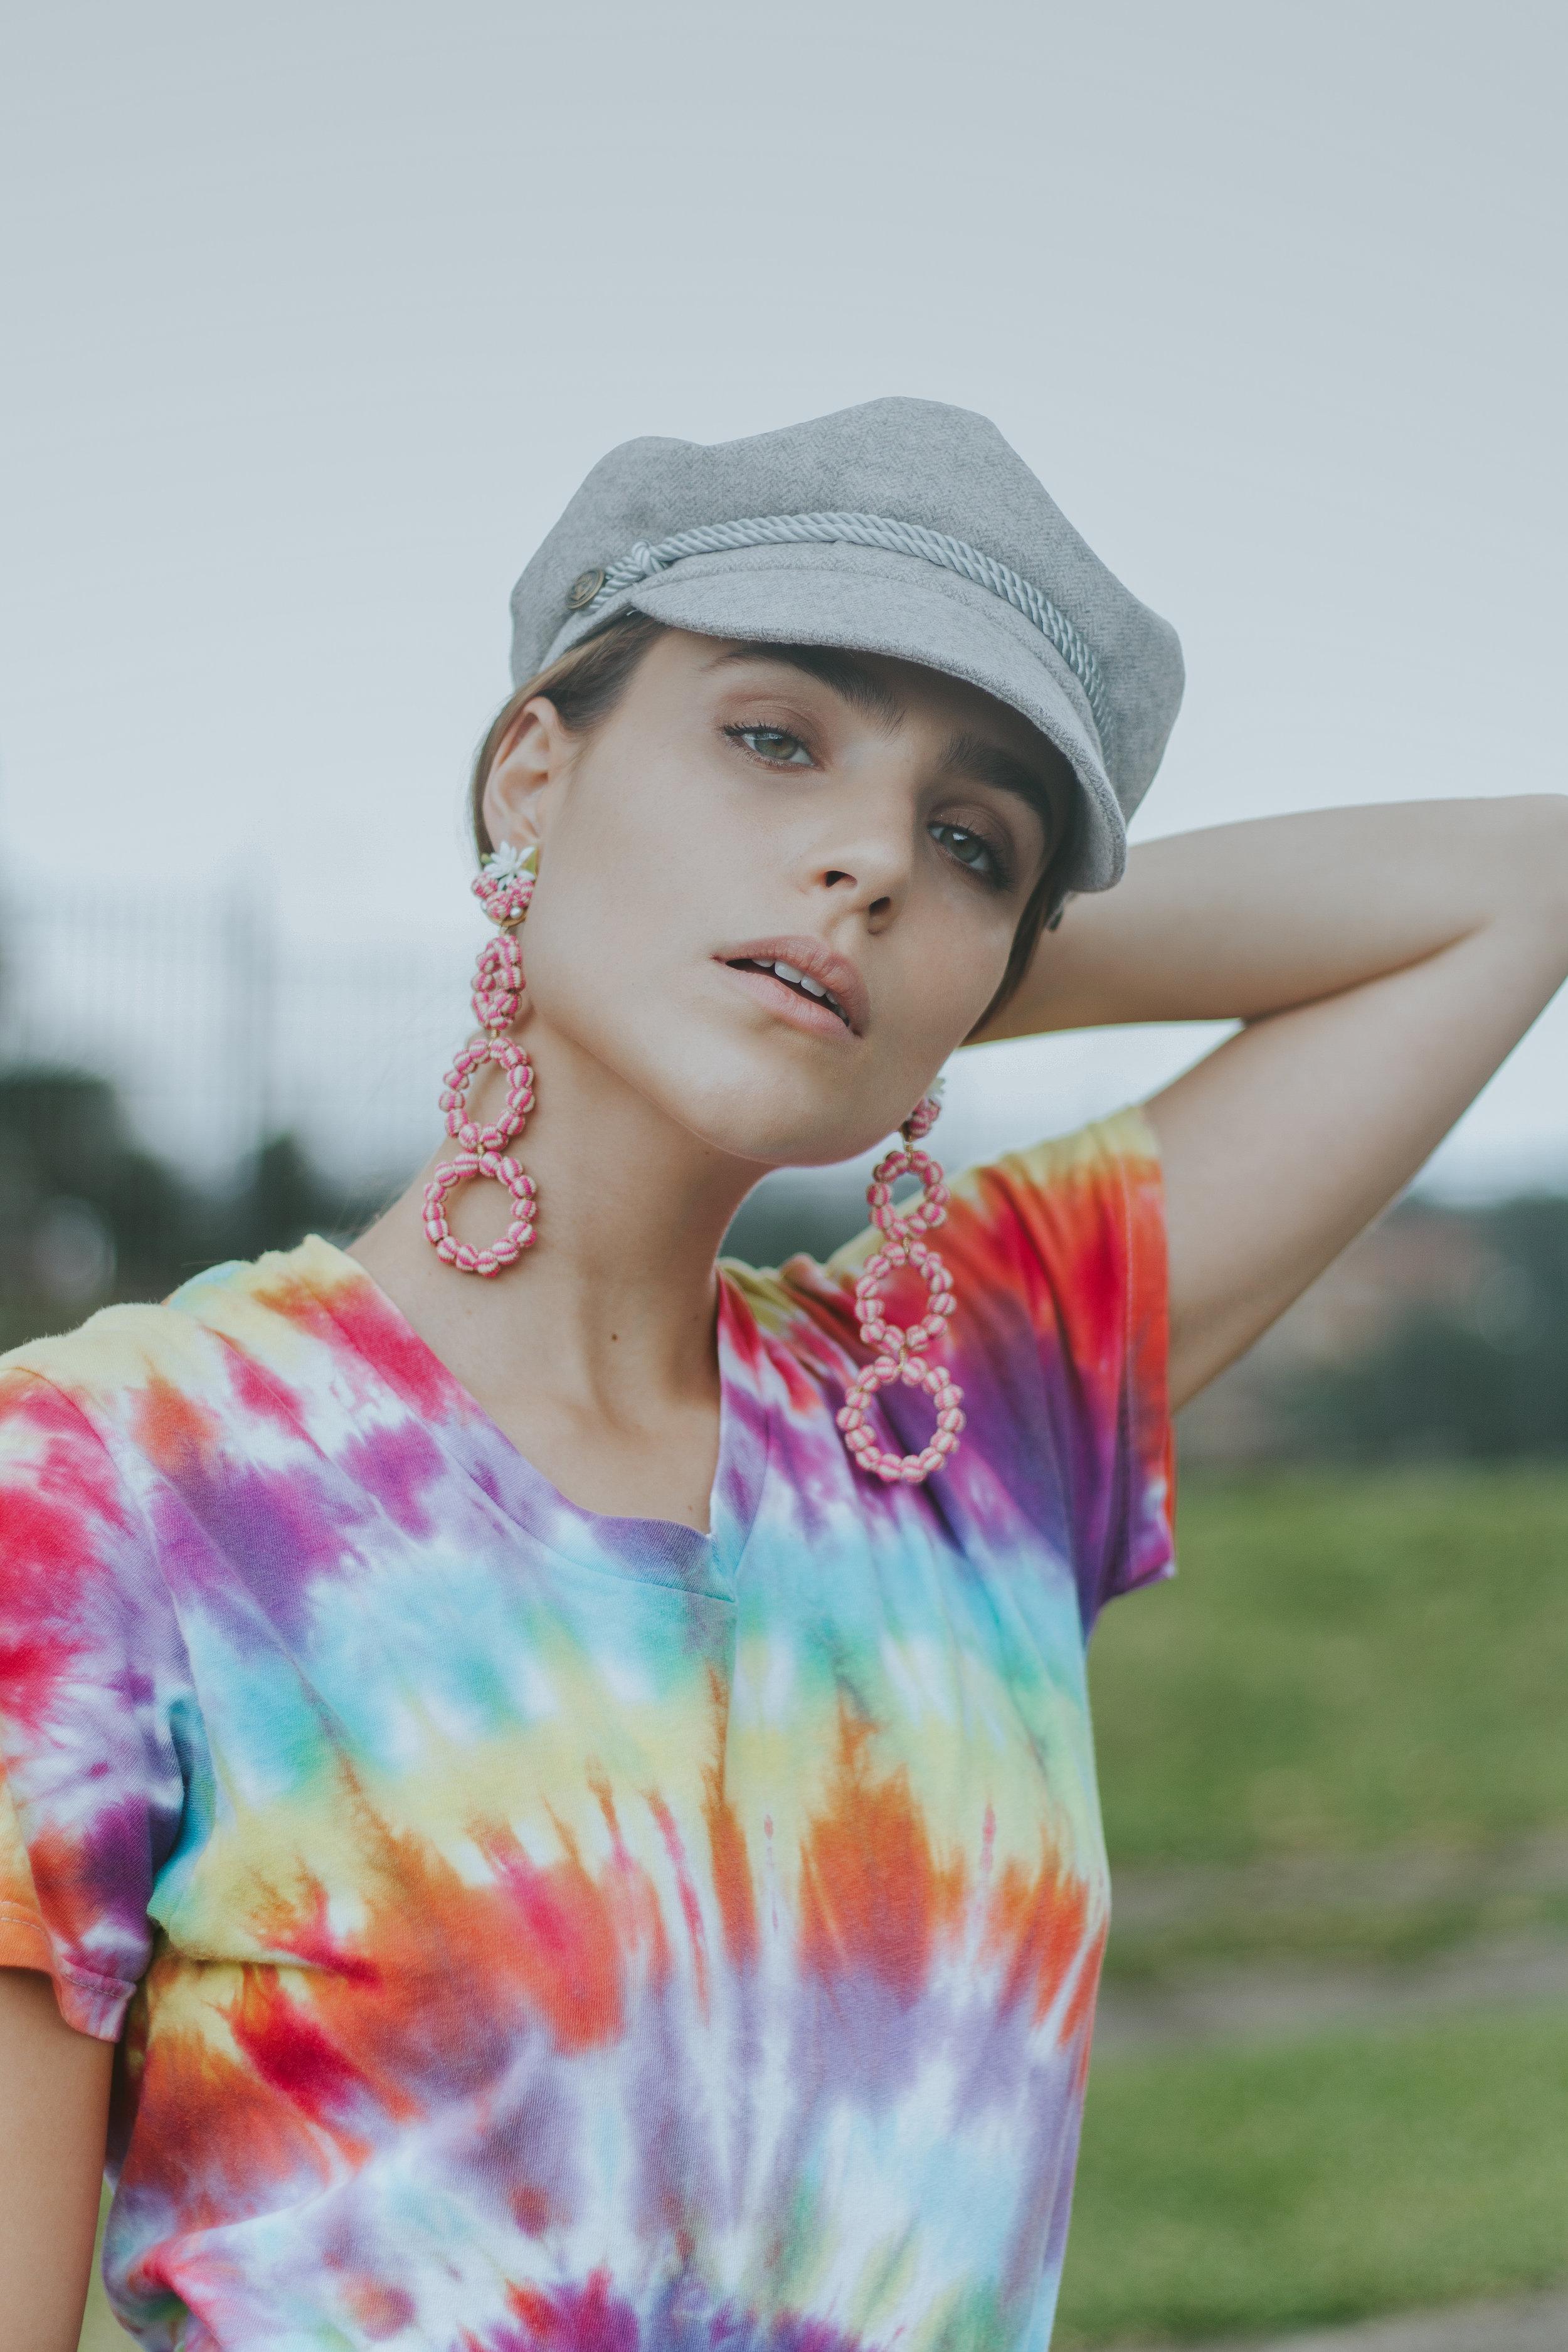 De Noche Vintage T-shirt  Mercedes Salazar earrings via Corazon de Piña